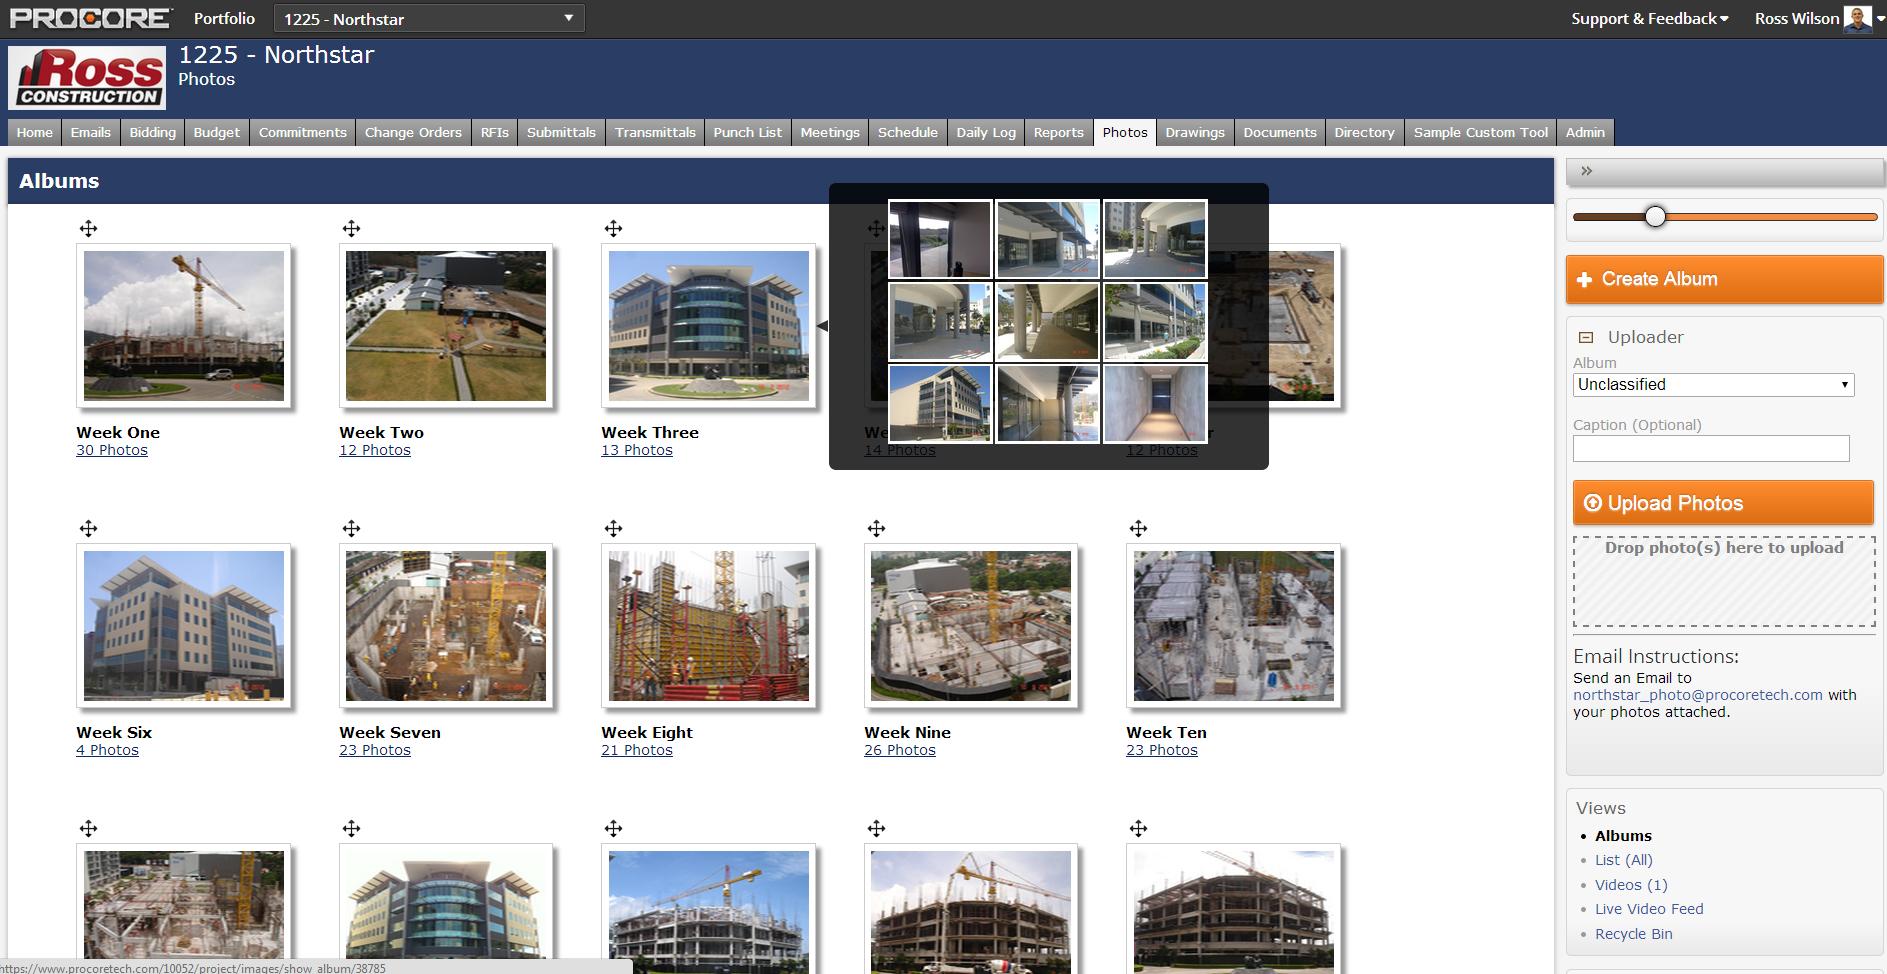 Procore screenshot # 4   Procore   Construction project management